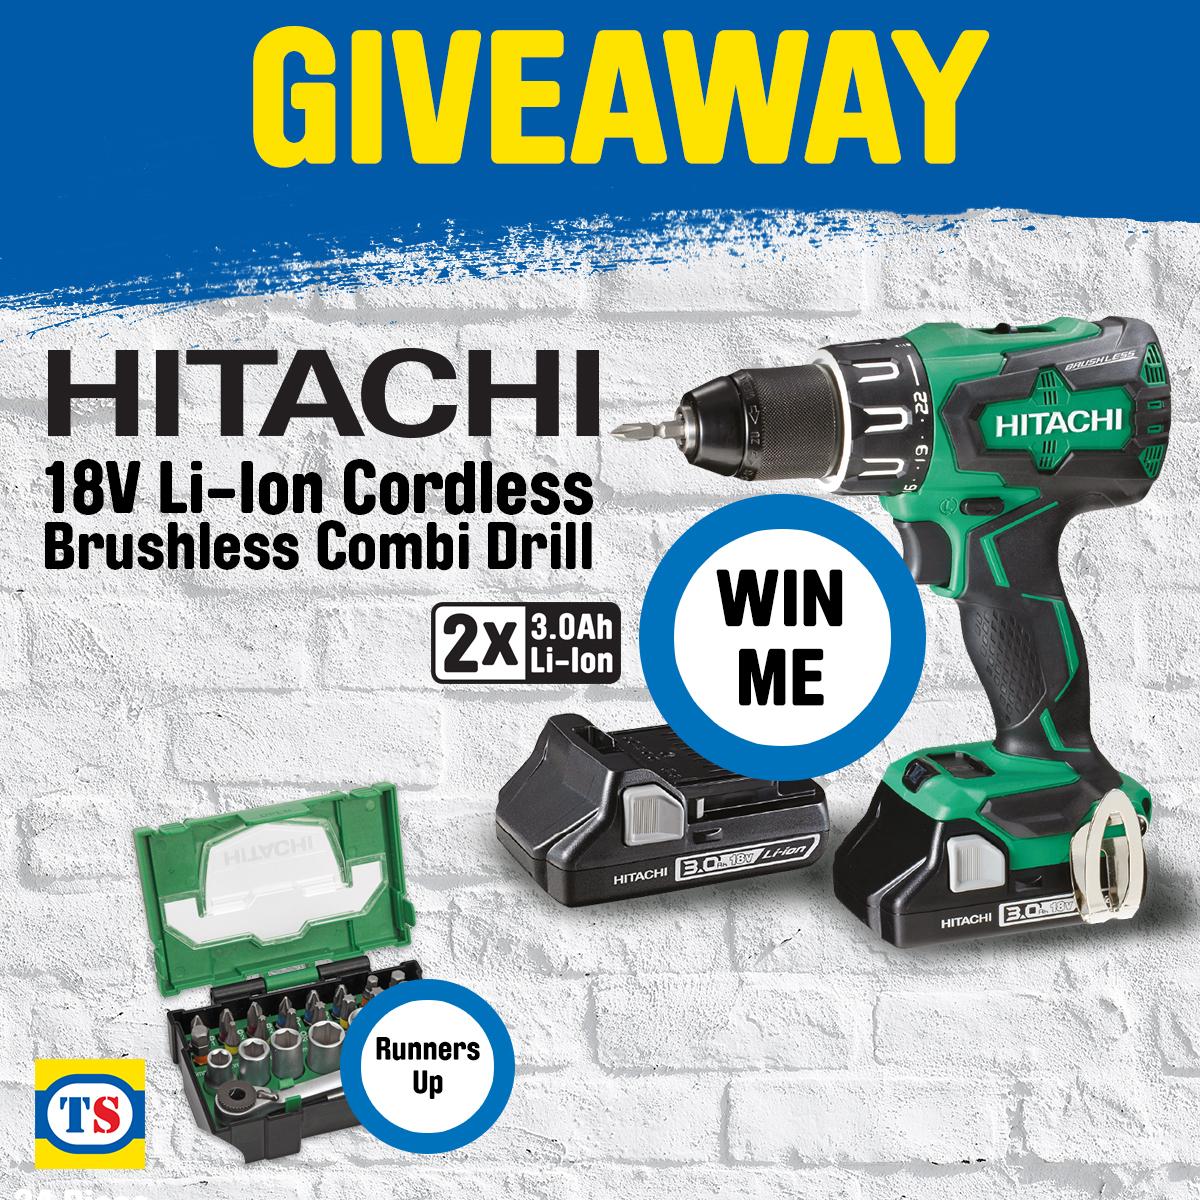 Hitachi Giveaway